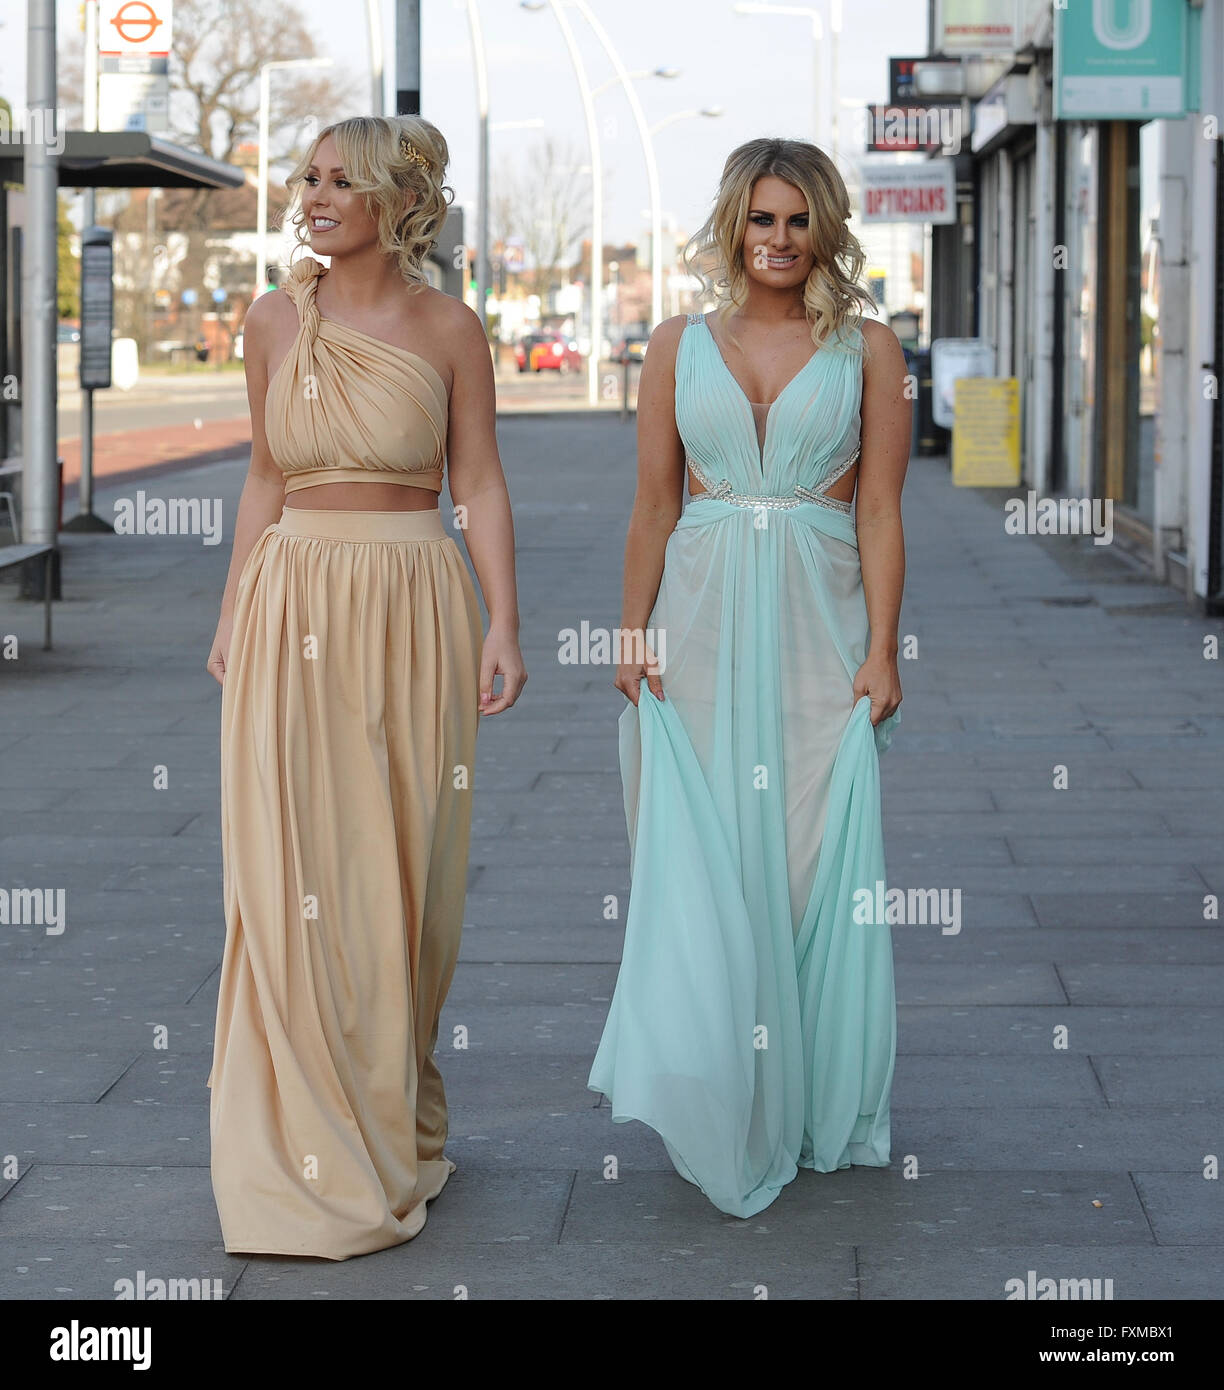 Nice Theme Party Dress Up Ideas Photo - All Wedding Dresses ...